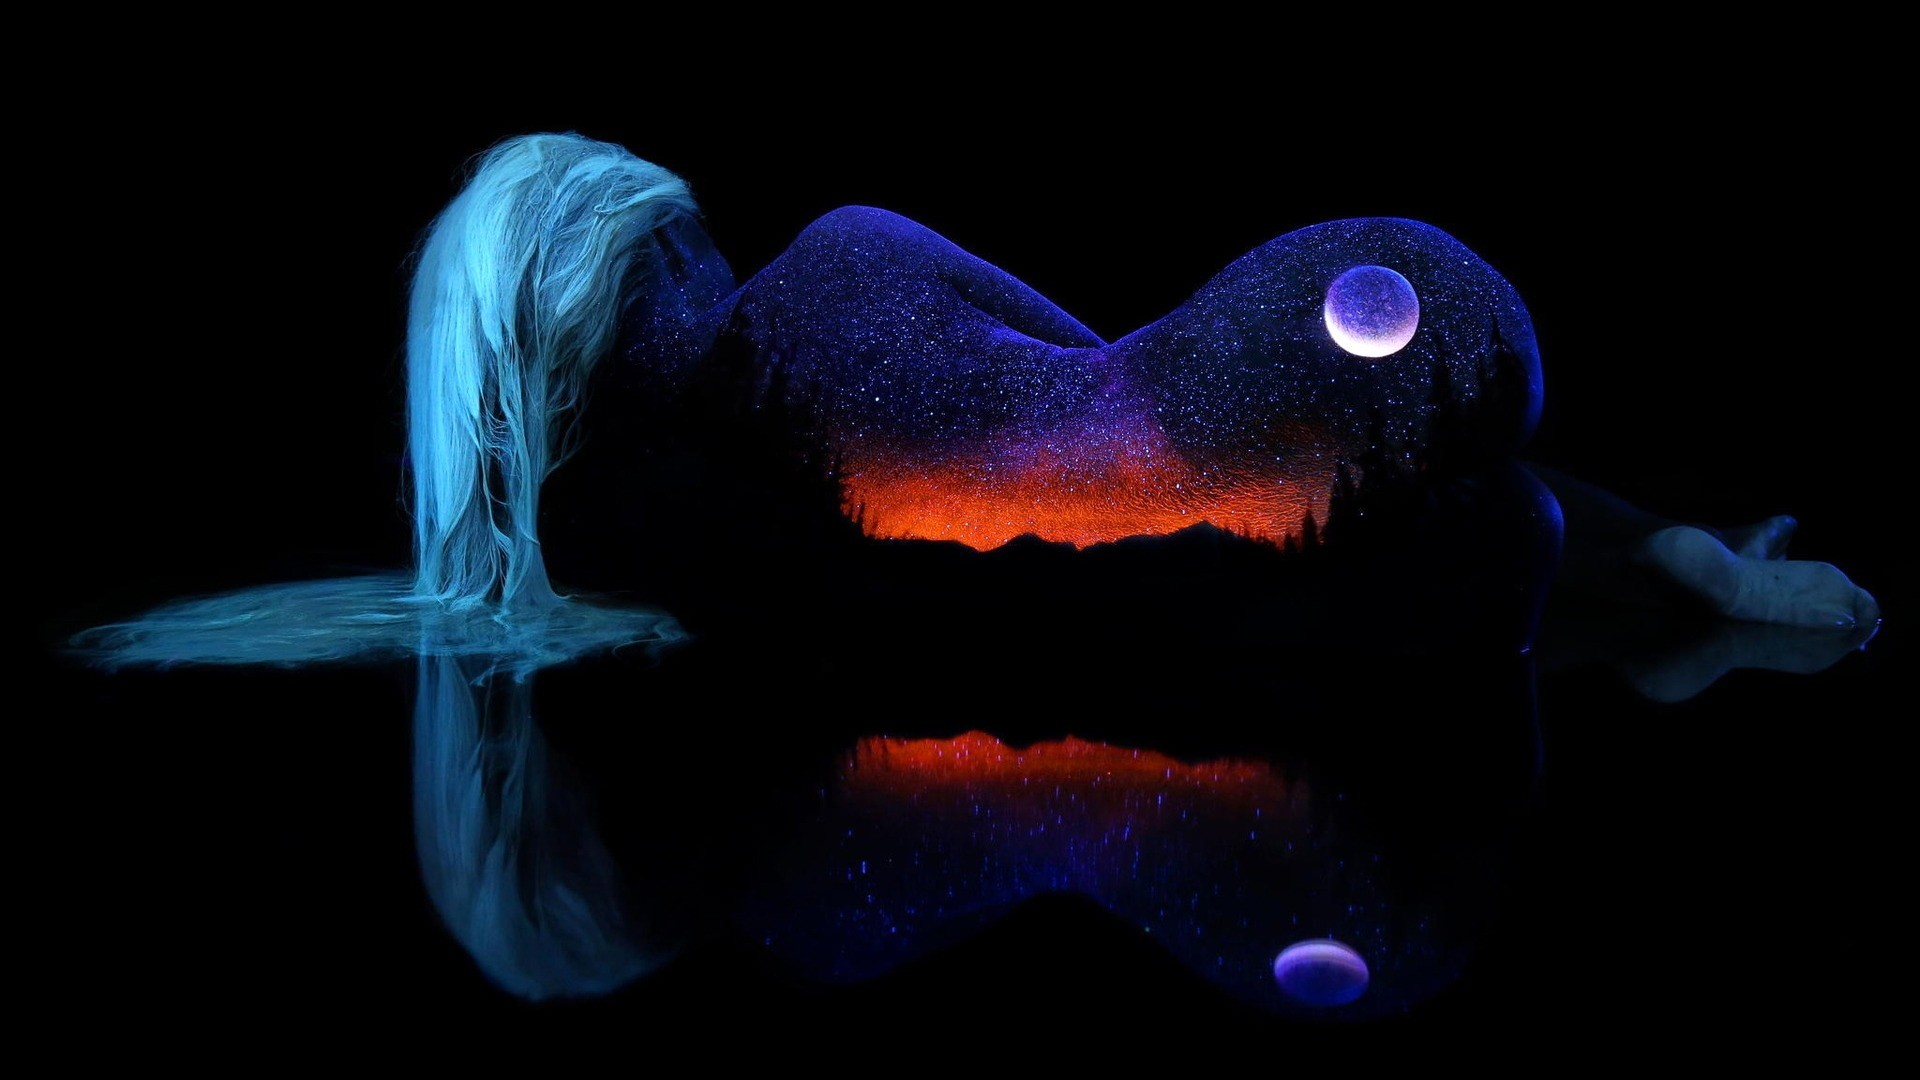 General 1920x1080 women artwork stars erotic art  back nature aqua hair reflection simple background black background Moon rear view digital art sky